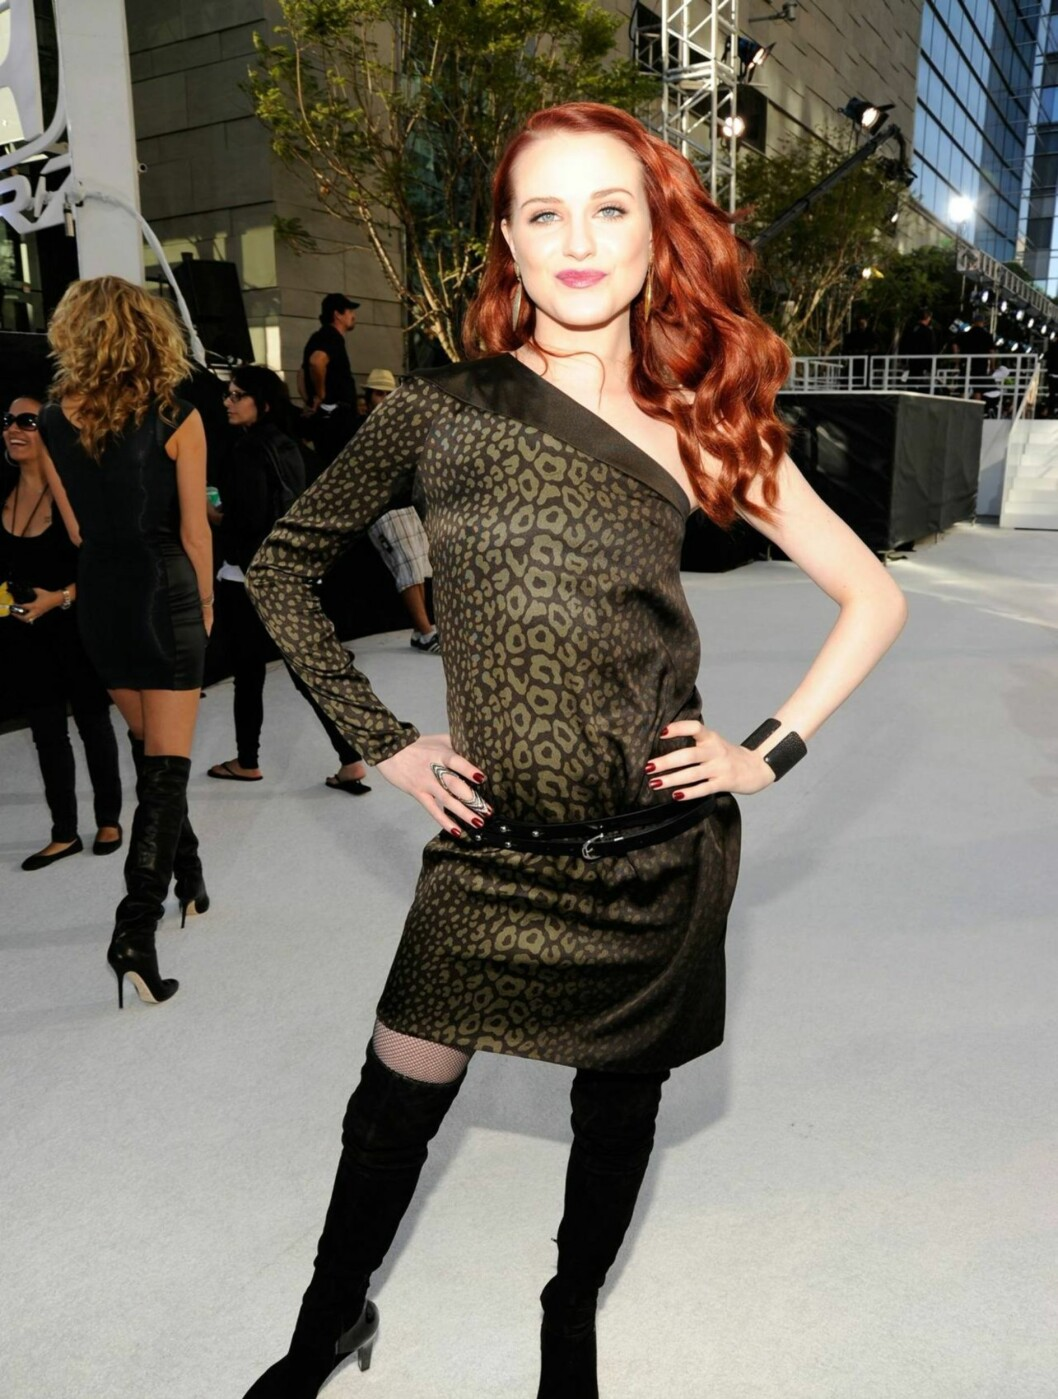 VERST: «True Blood»-stjernen Evan Rachel Wood fikk negativ omtale for denne Gucci-kjolen.  Foto: All Over Press